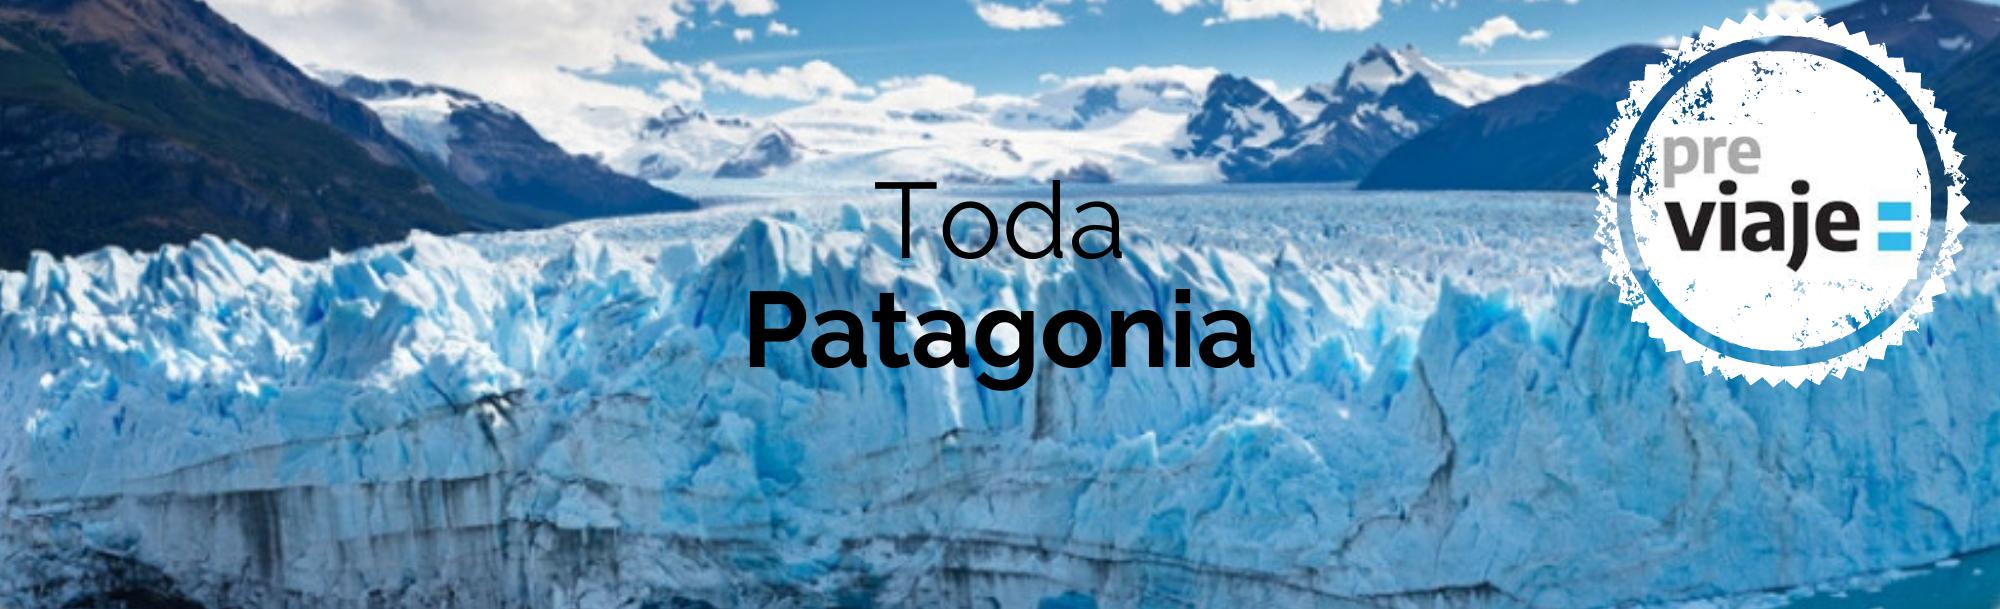 Toda Patagonia